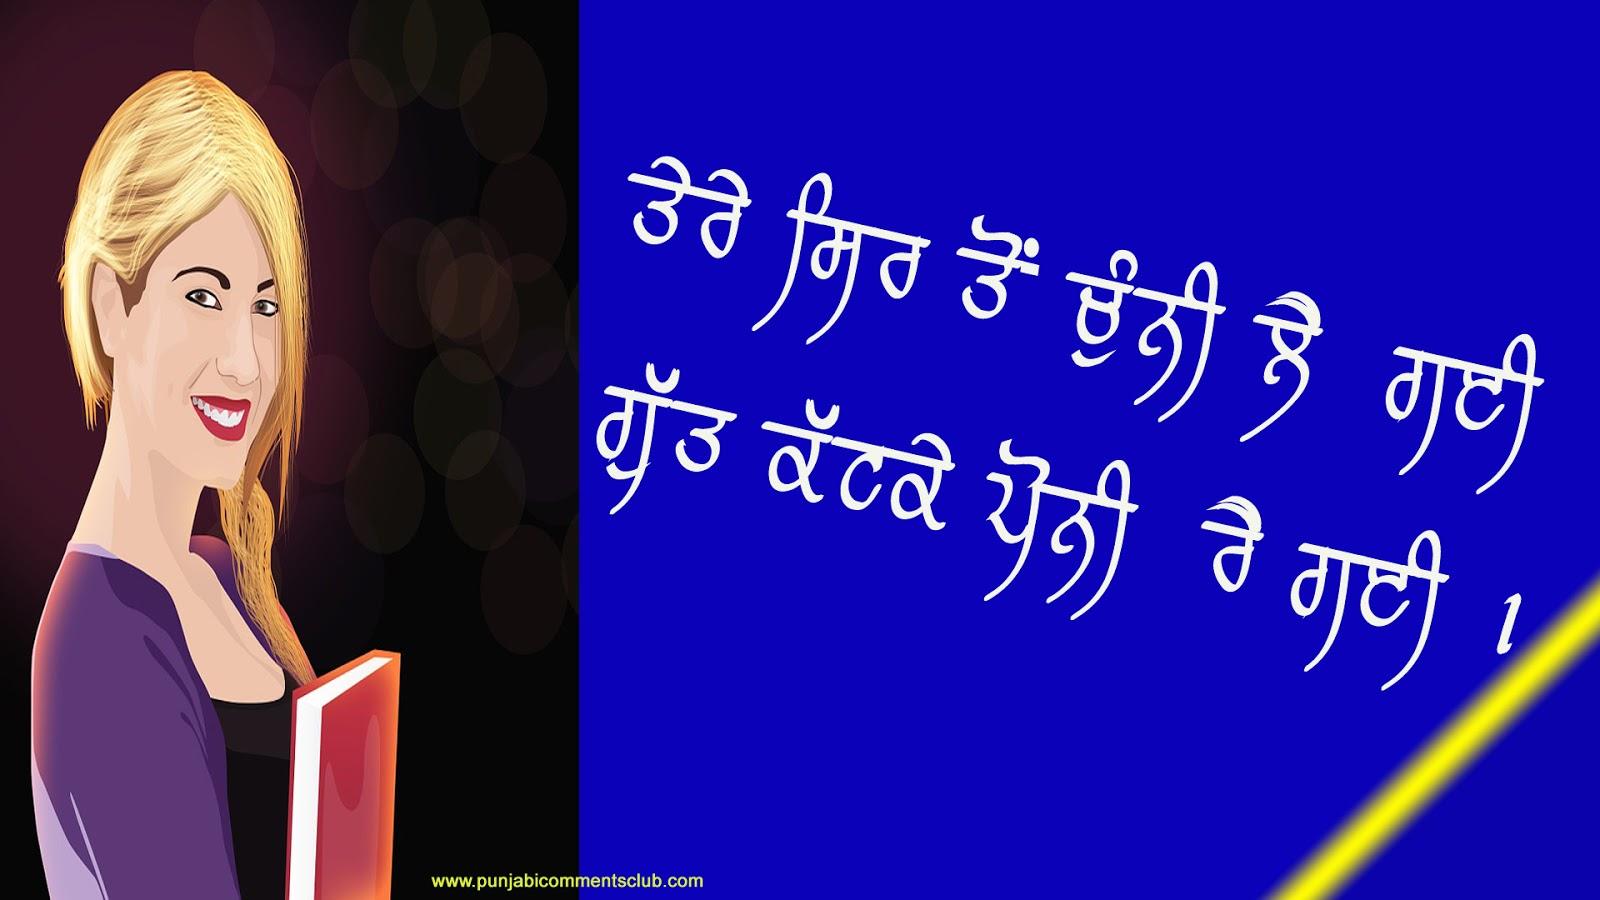 Funny Punjabi status ਤੇਰੇ ਸਿਰ ਤੋਂ